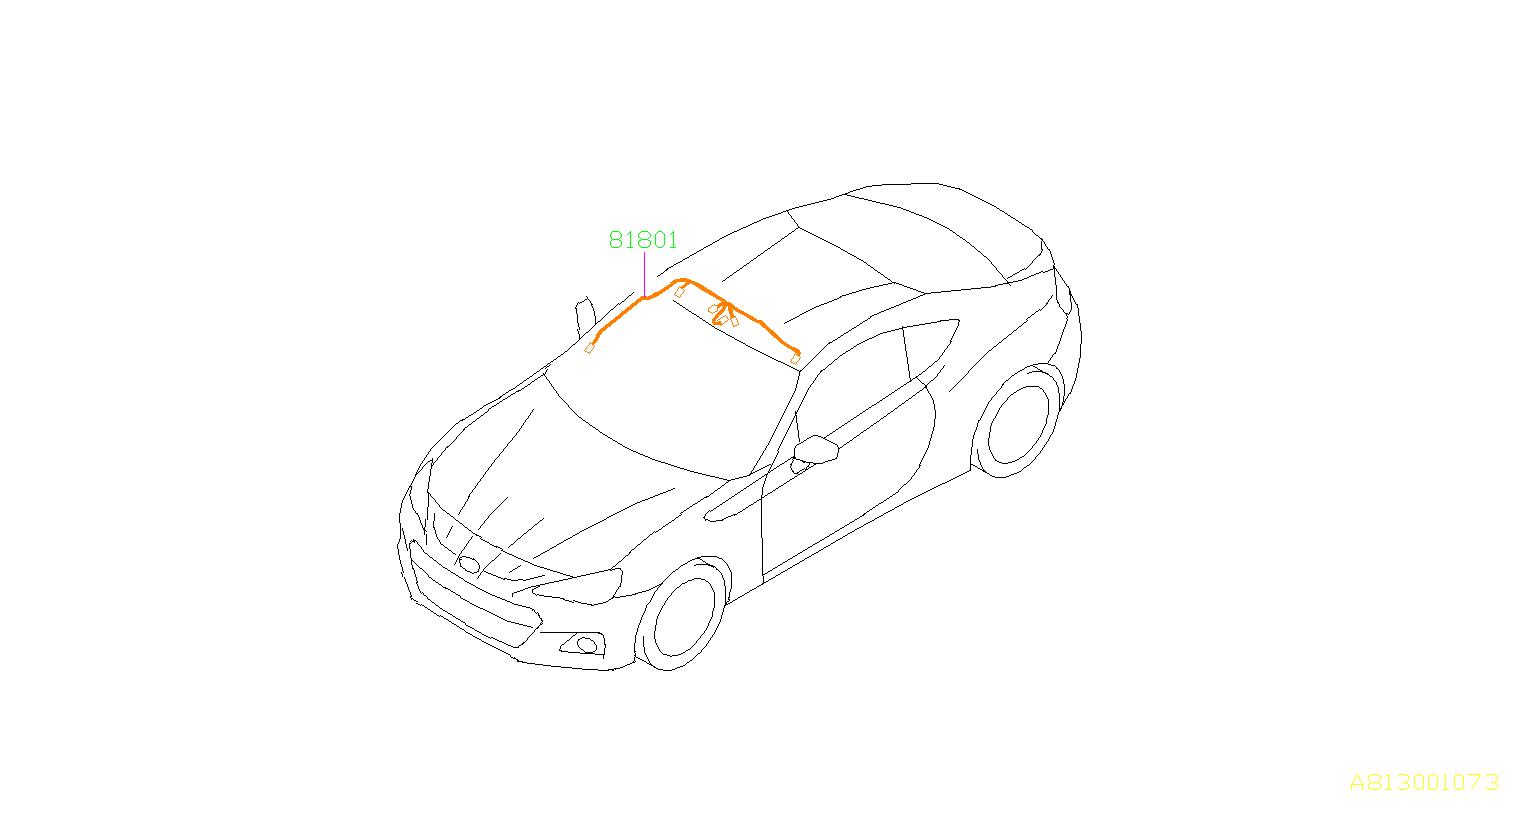 Subaru Brz Cord Roof Electrical